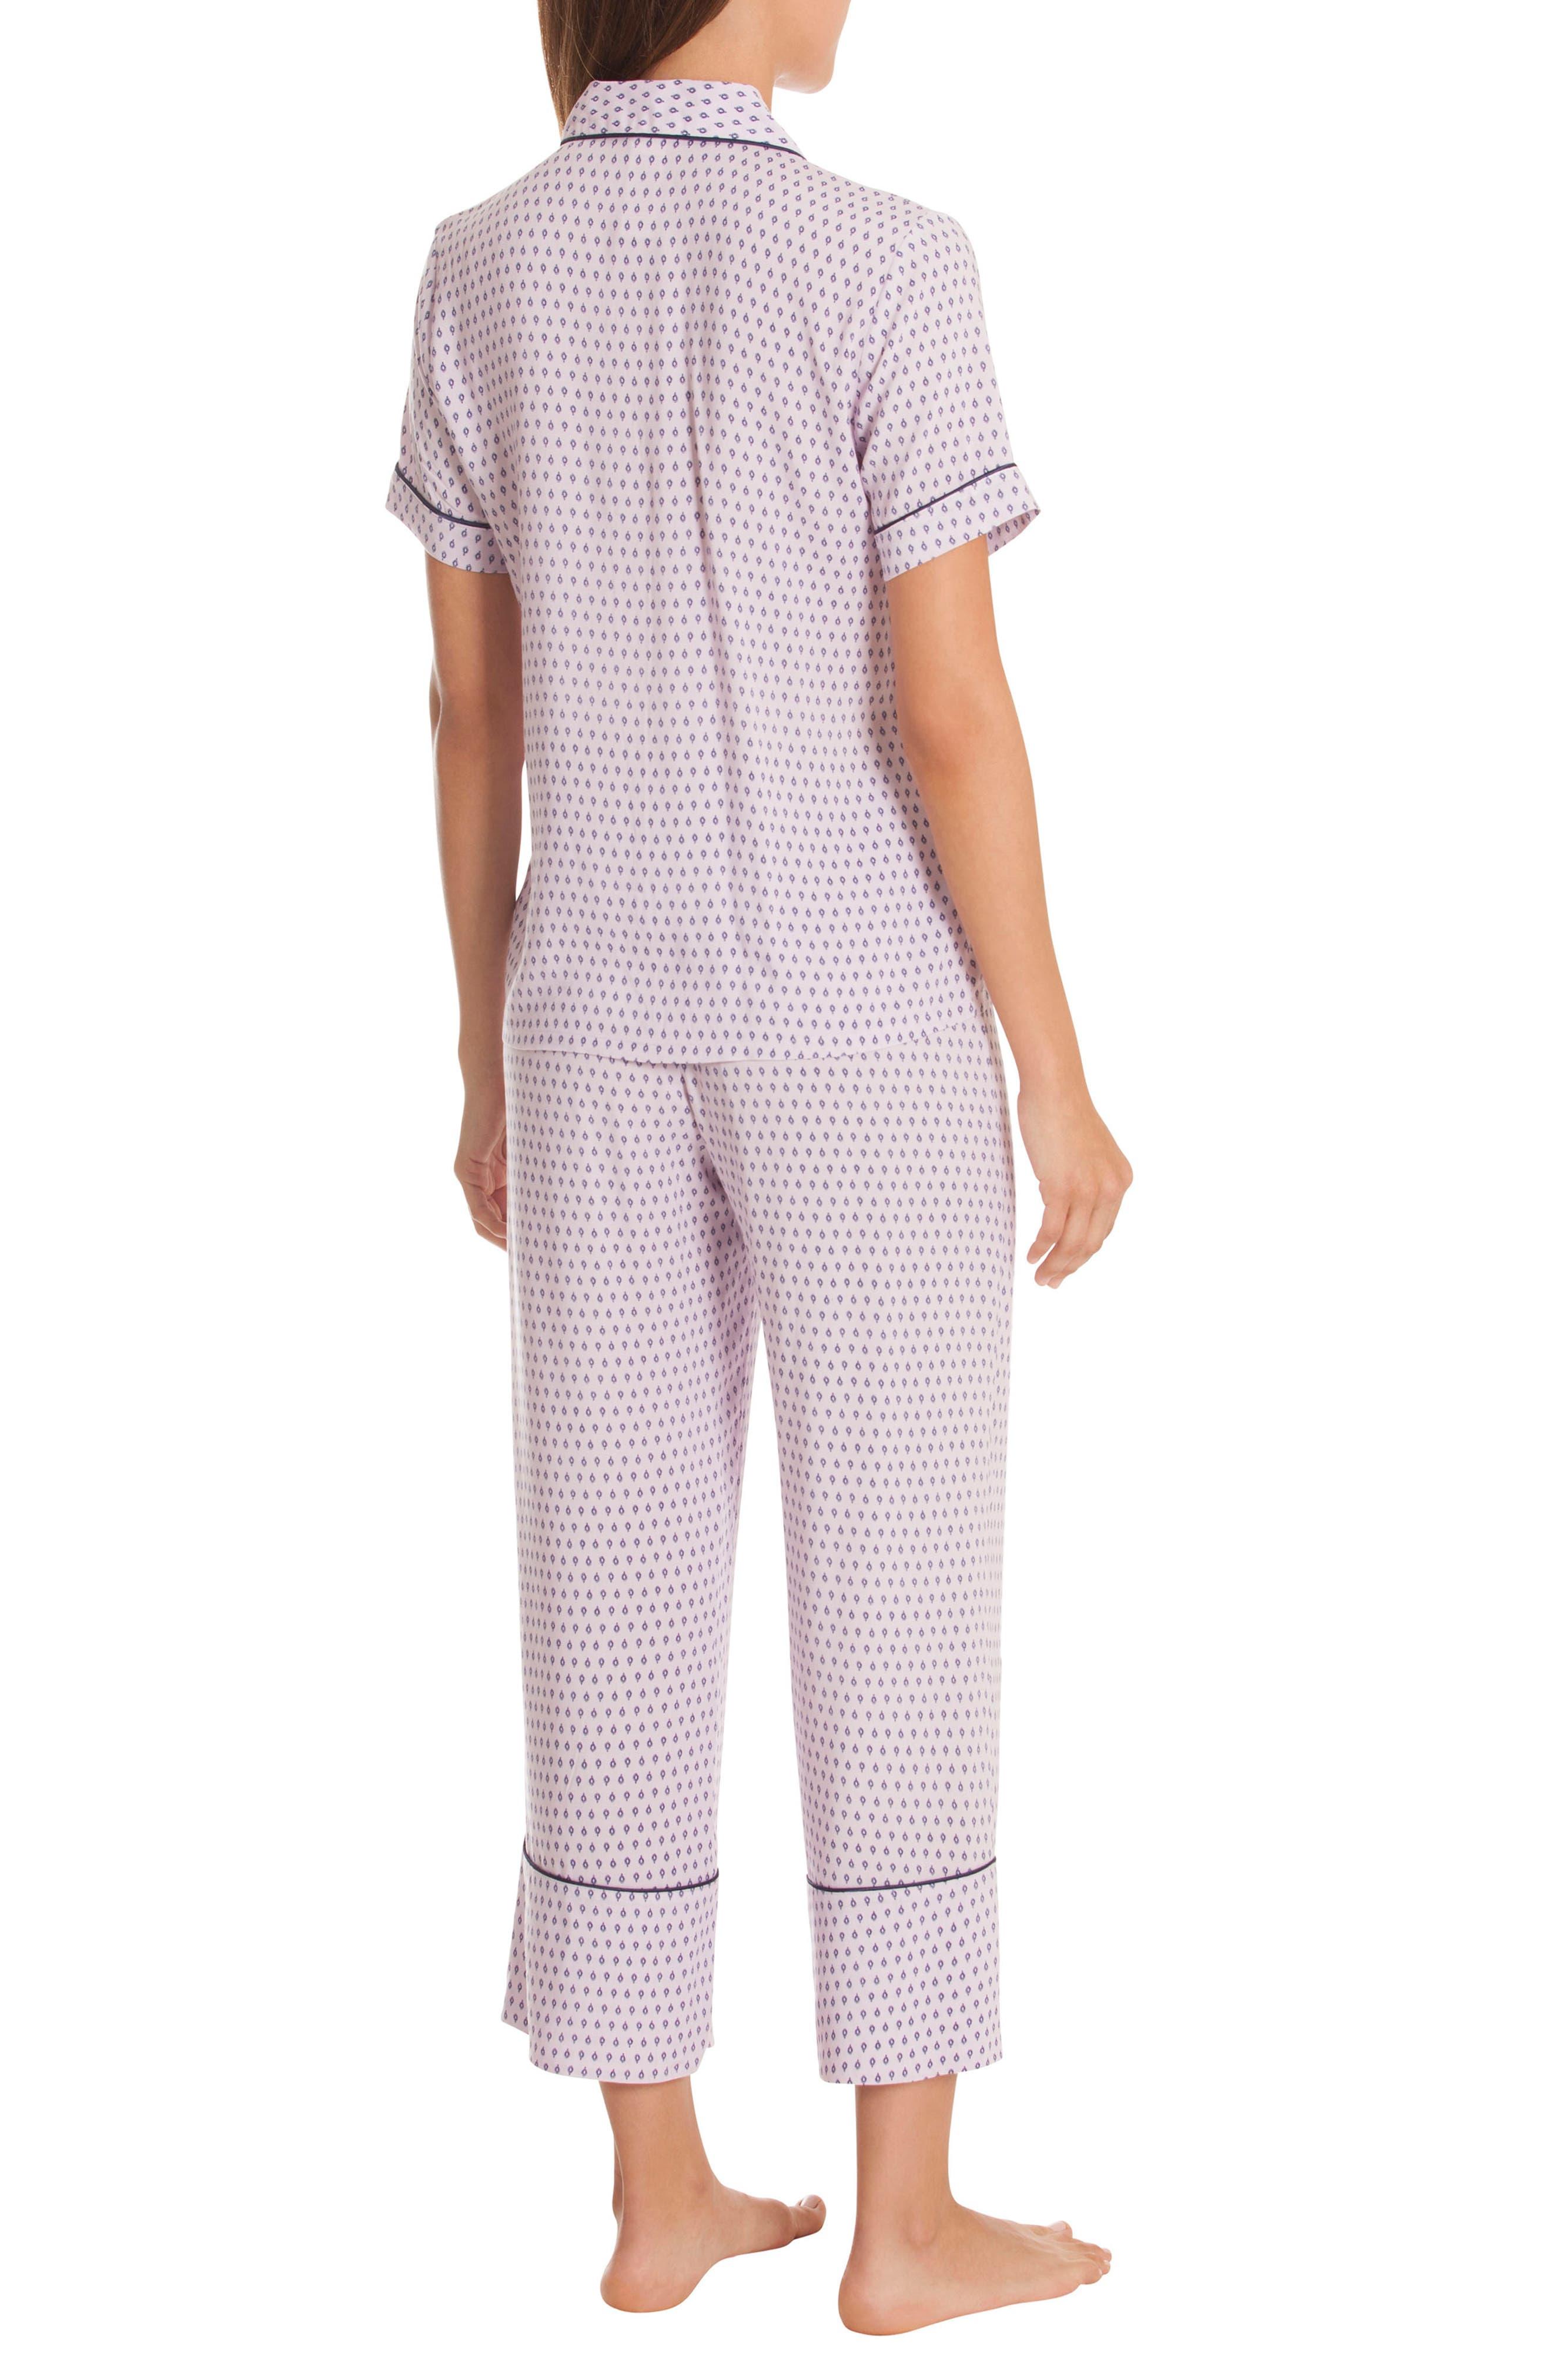 Crop Pajamas,                             Alternate thumbnail 2, color,                             DITSY FOULARD-LAVENDAR